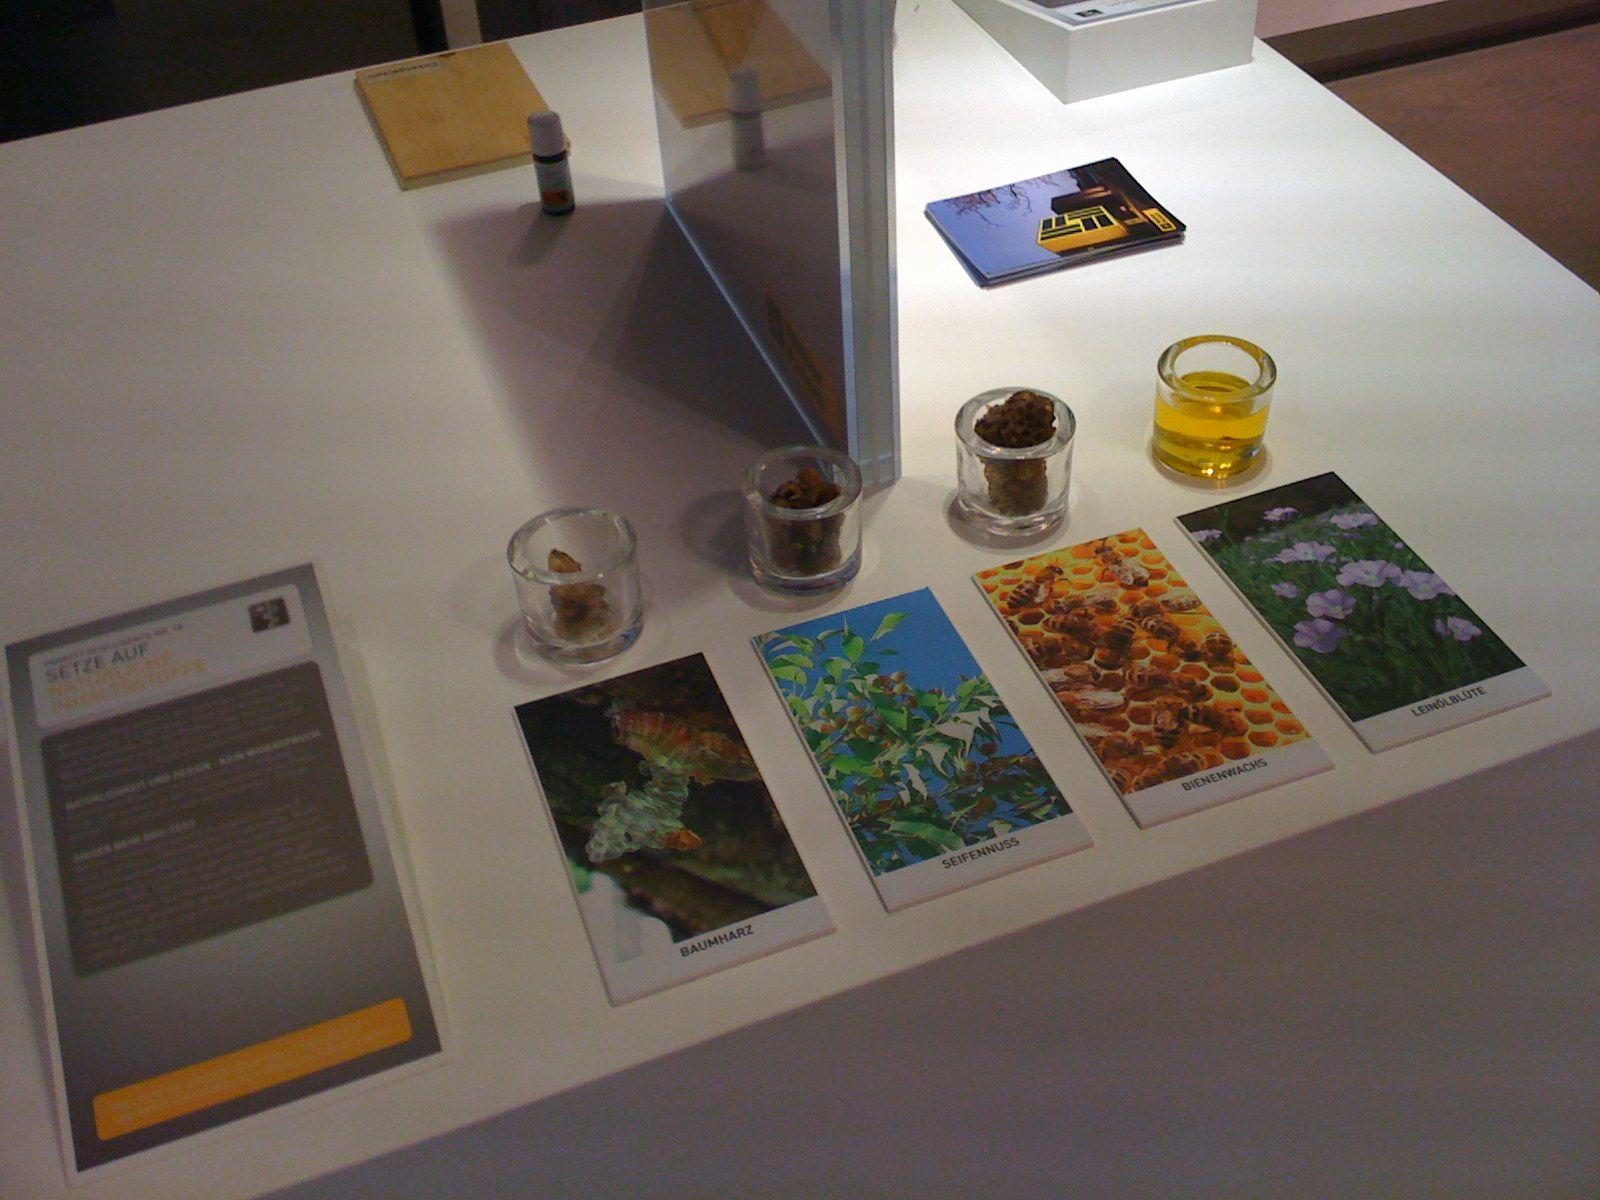 Commercial Interiors · Weitzer Parkett Demonstrating Productsu0027 Materials